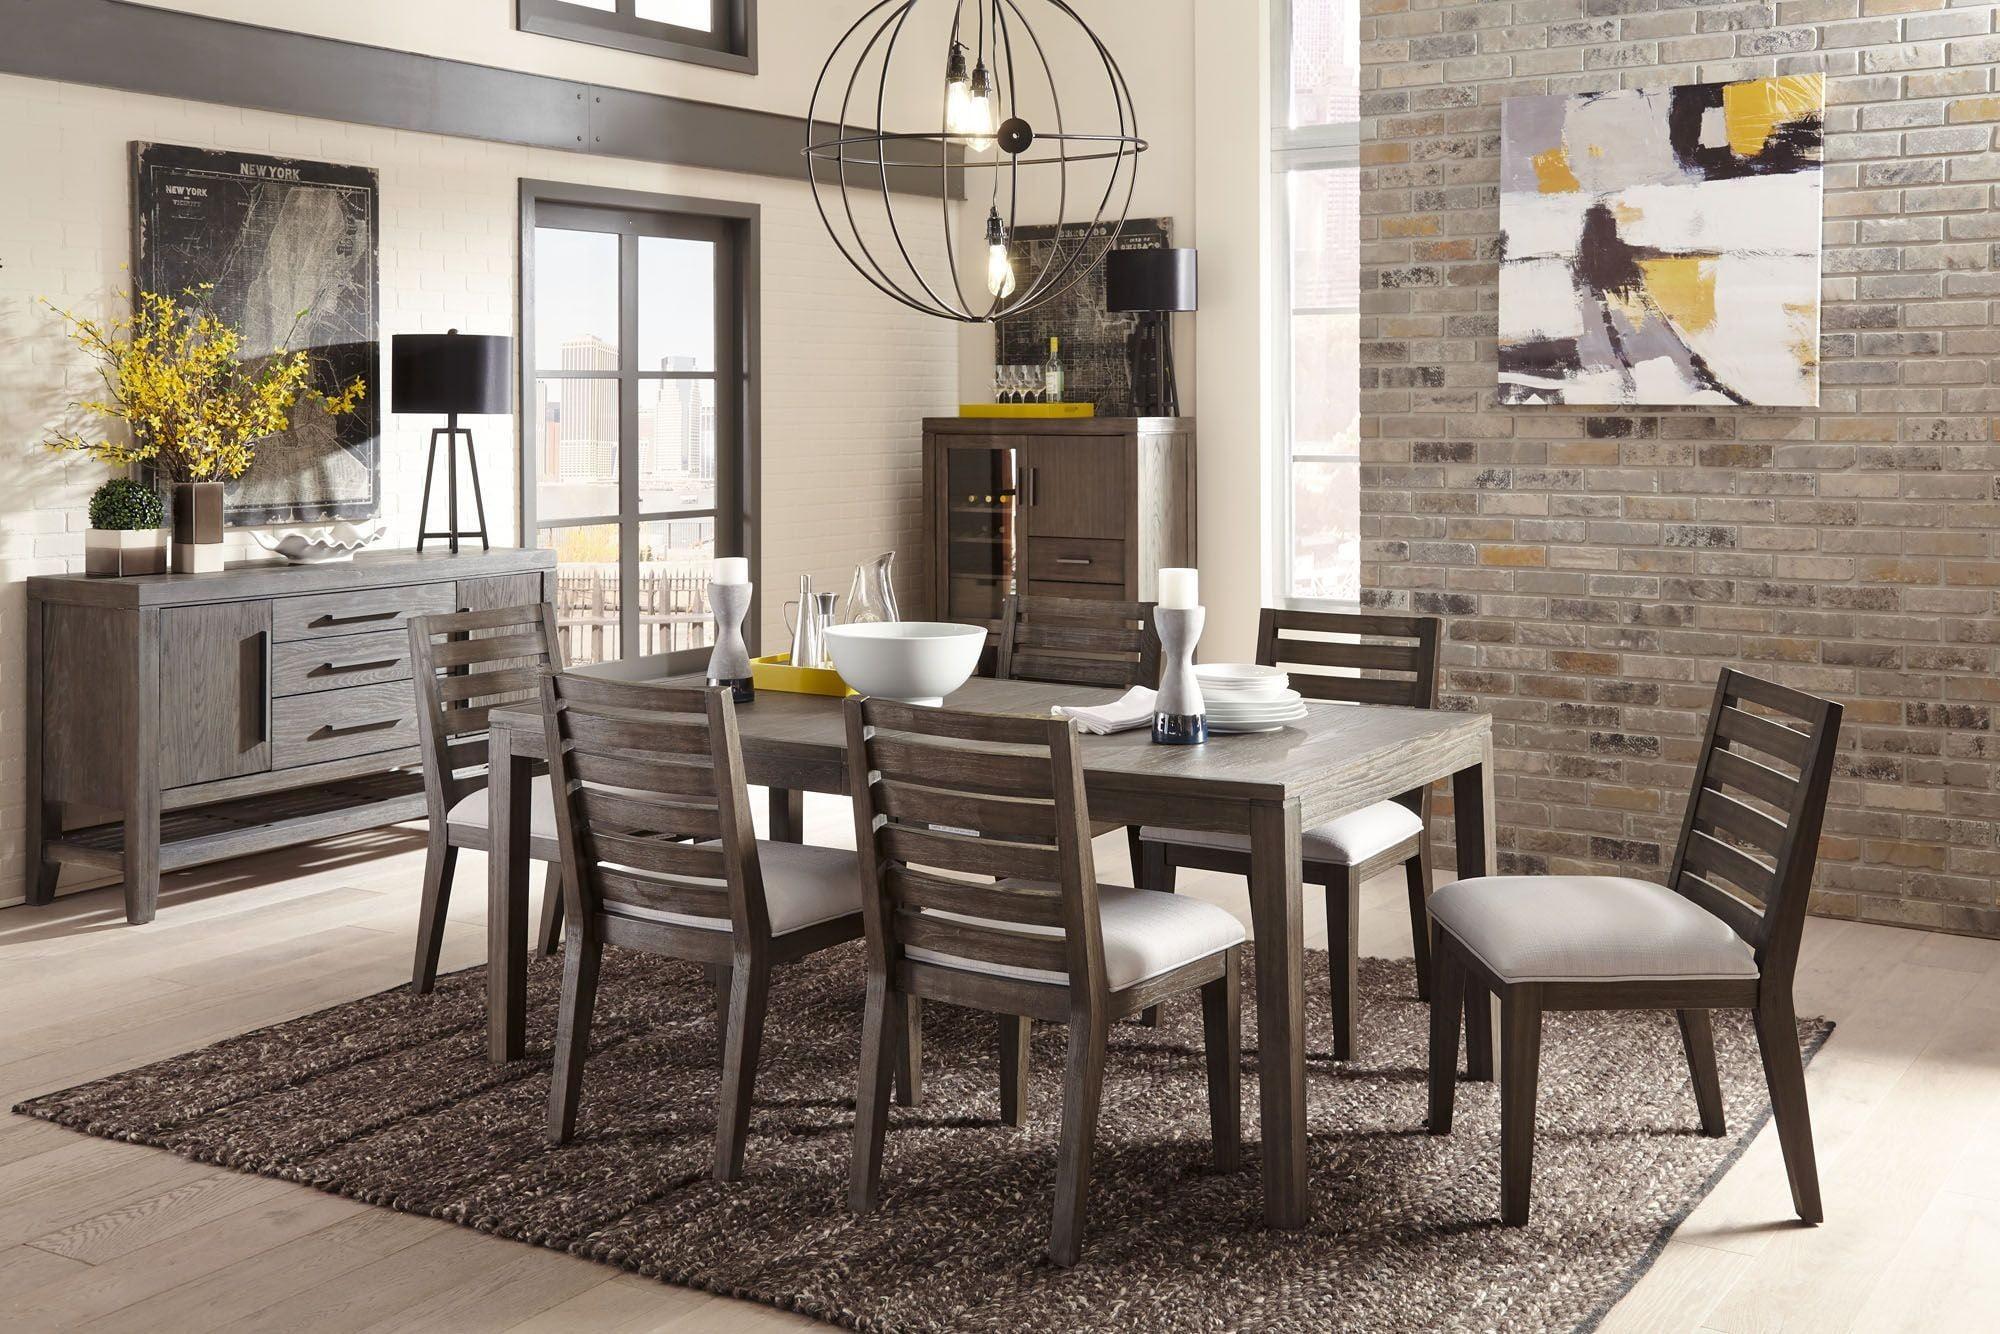 Bravo Platinum Oak Extendable Dining Room Set From Casana